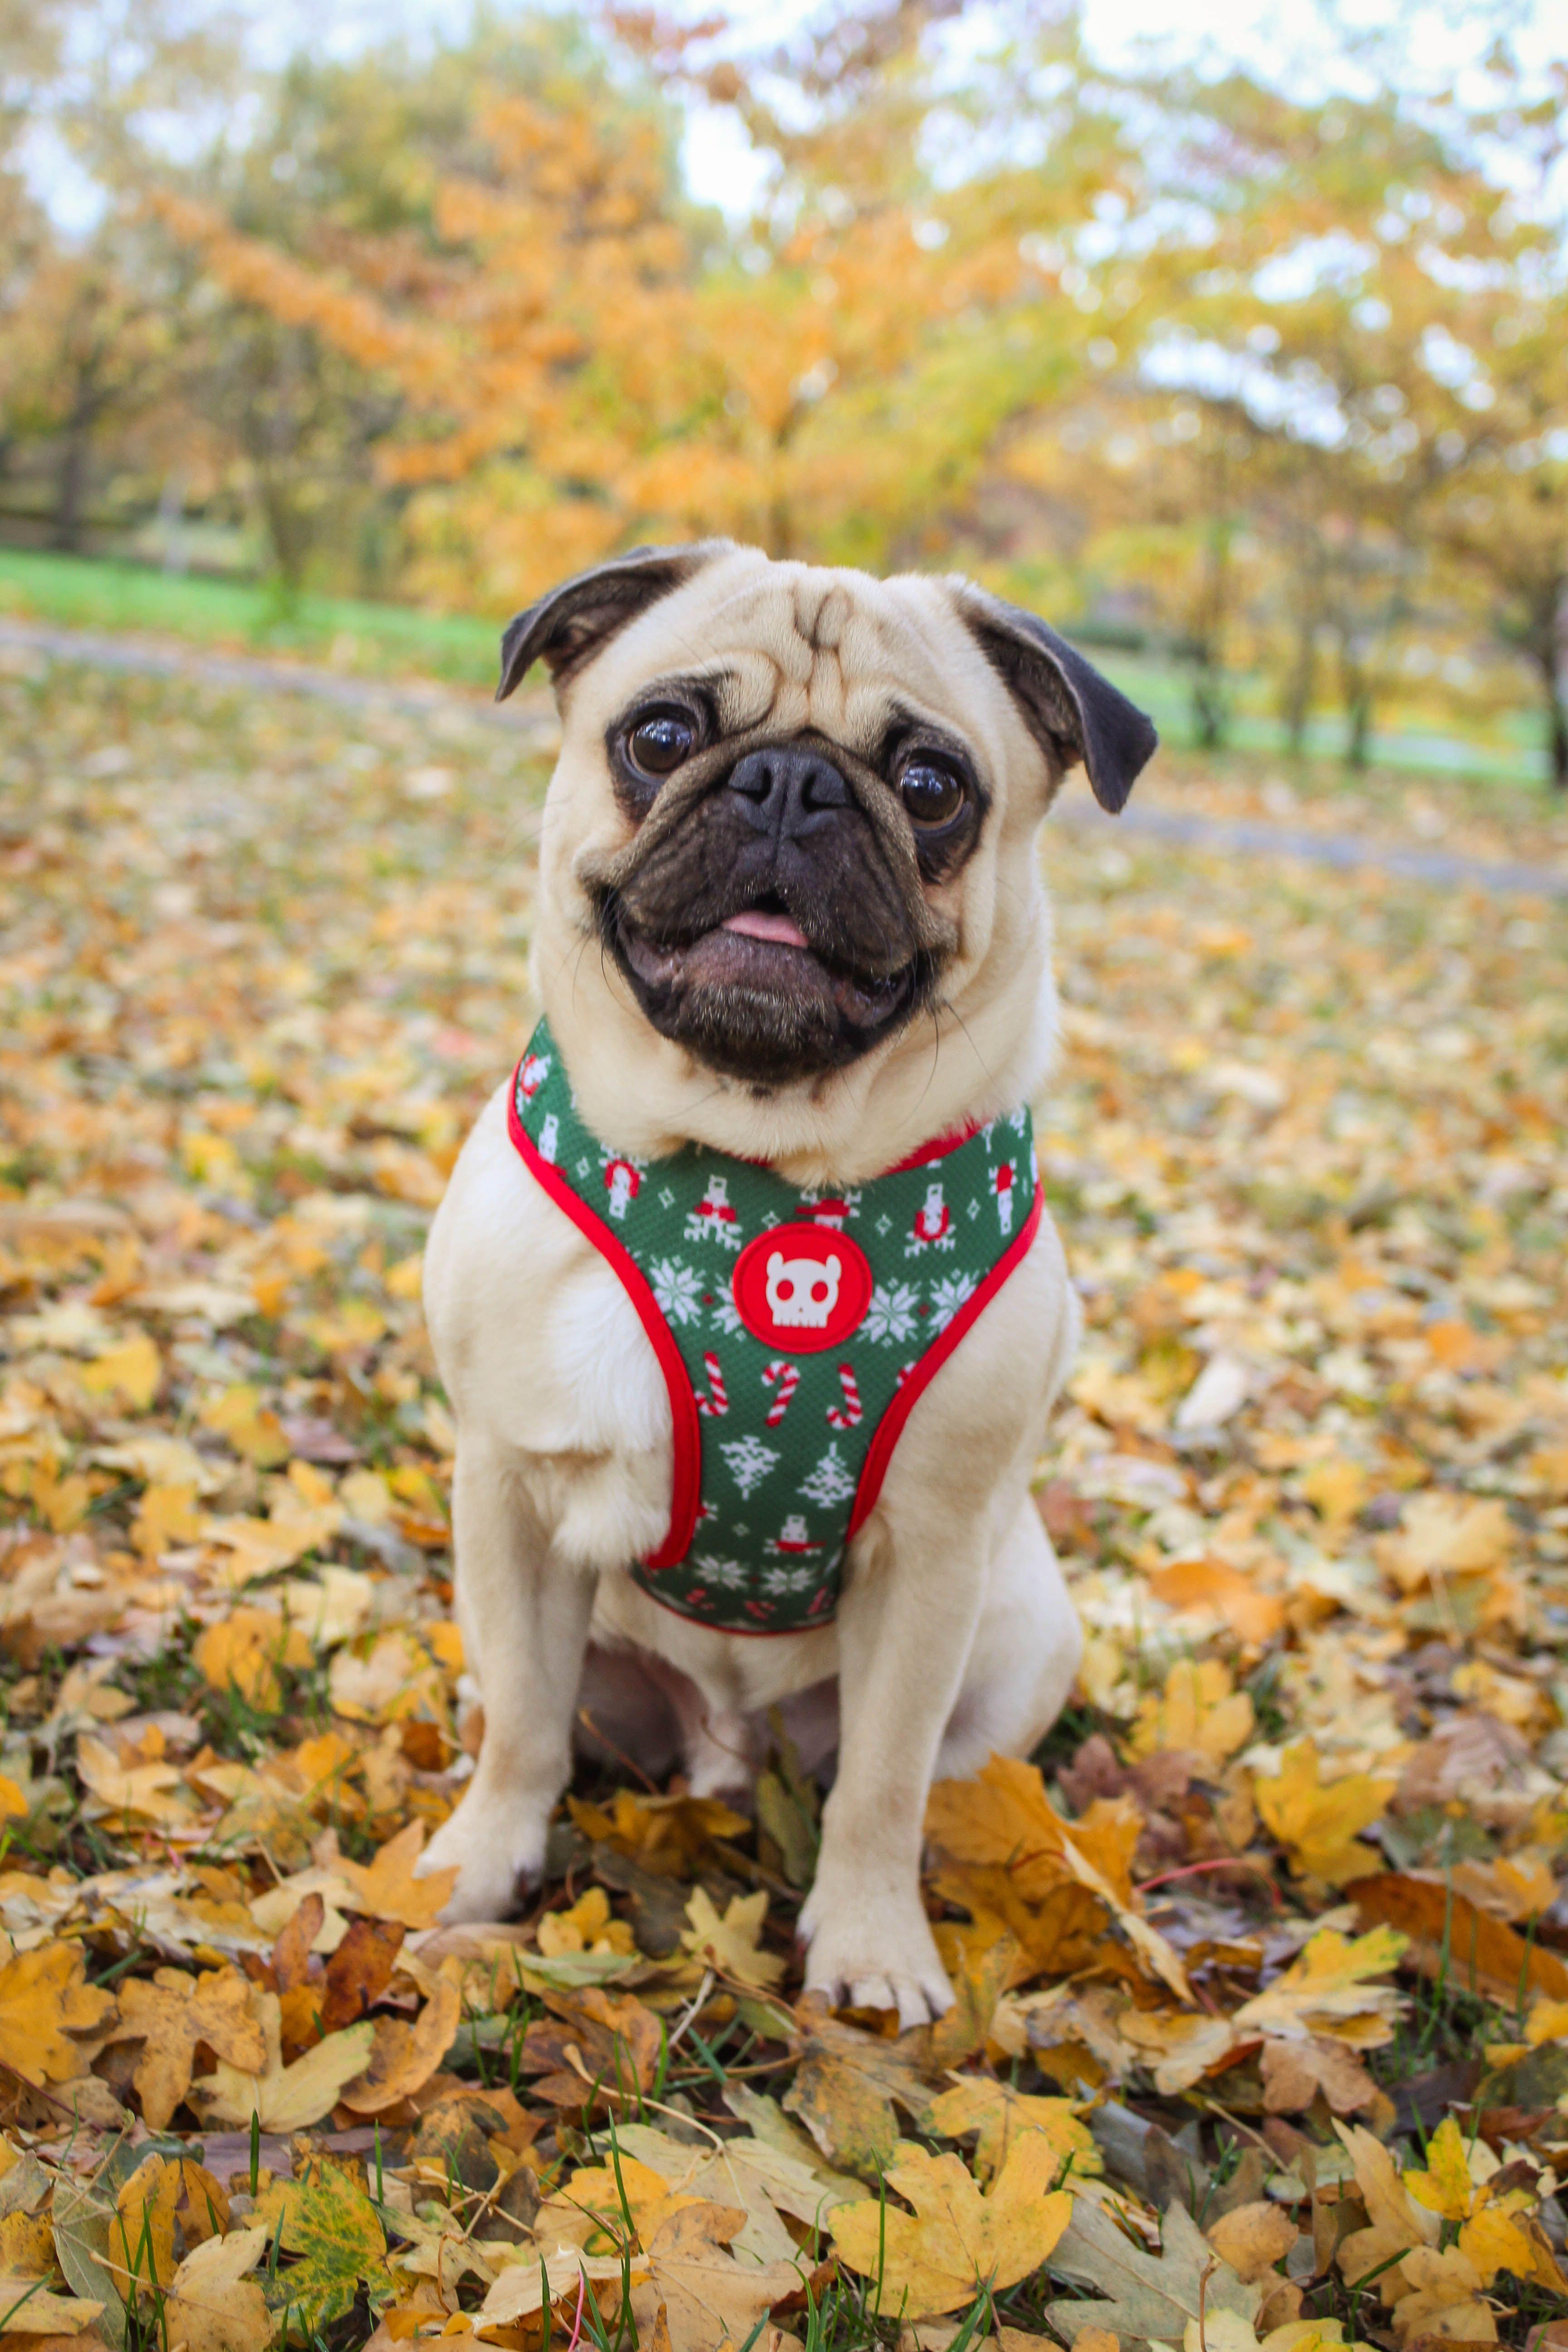 Pin By Sheri Schneider On Puggy Love Pugs Buzzfeed Animals Dog